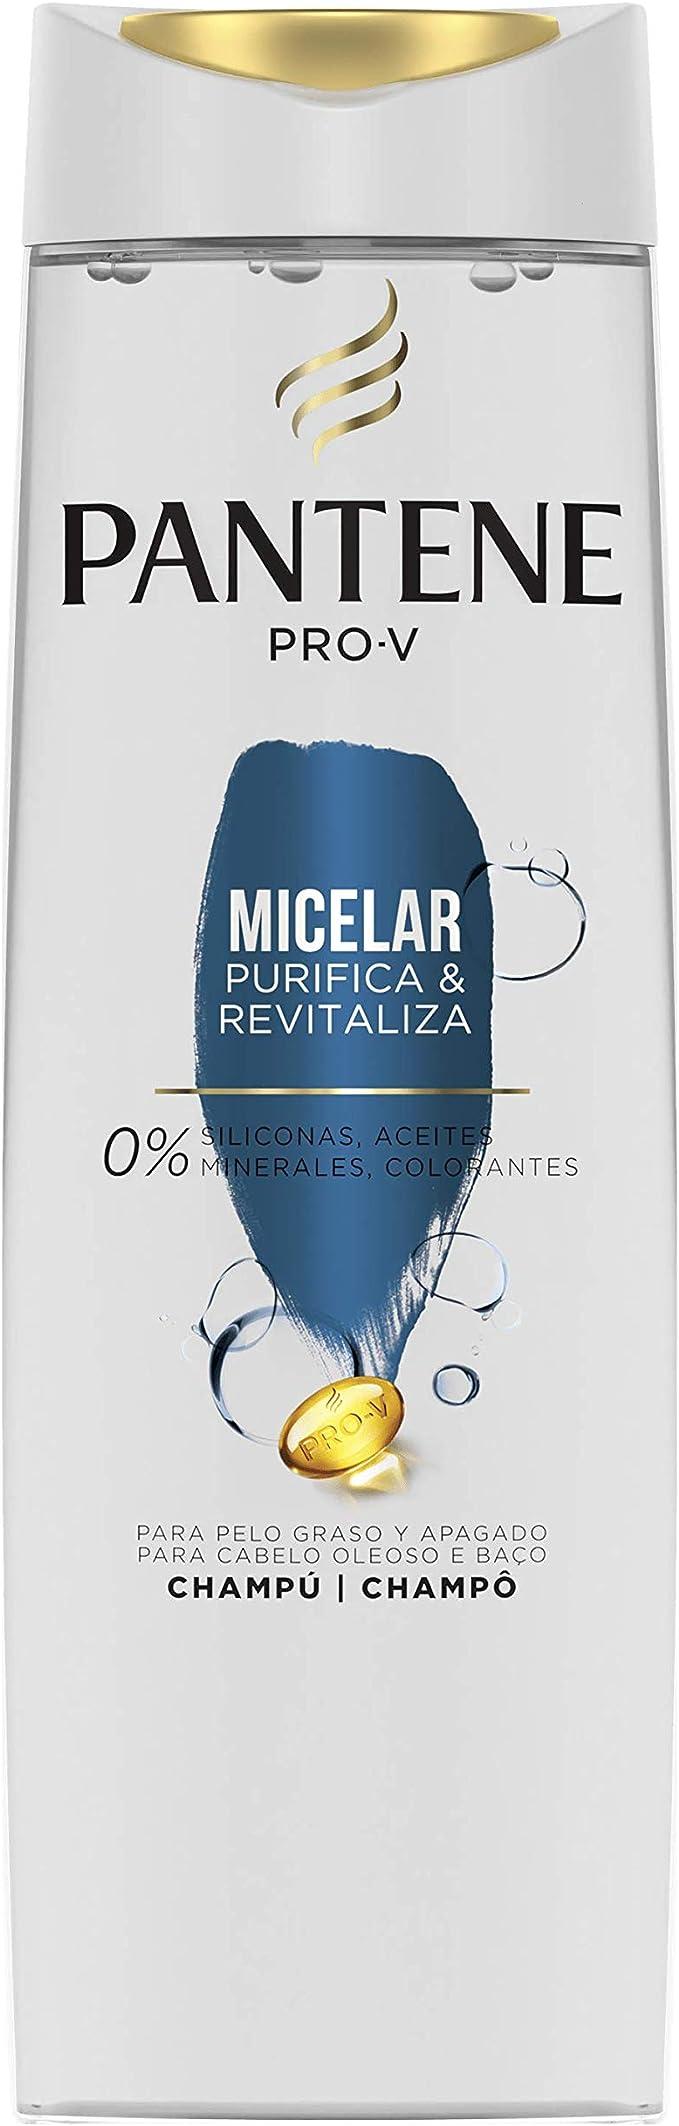 Pantene Pro-V Micelar Purifica & Revitaliza Champú, Revitaliza el Pelo de la Raíz a las Puntas, 360 ml